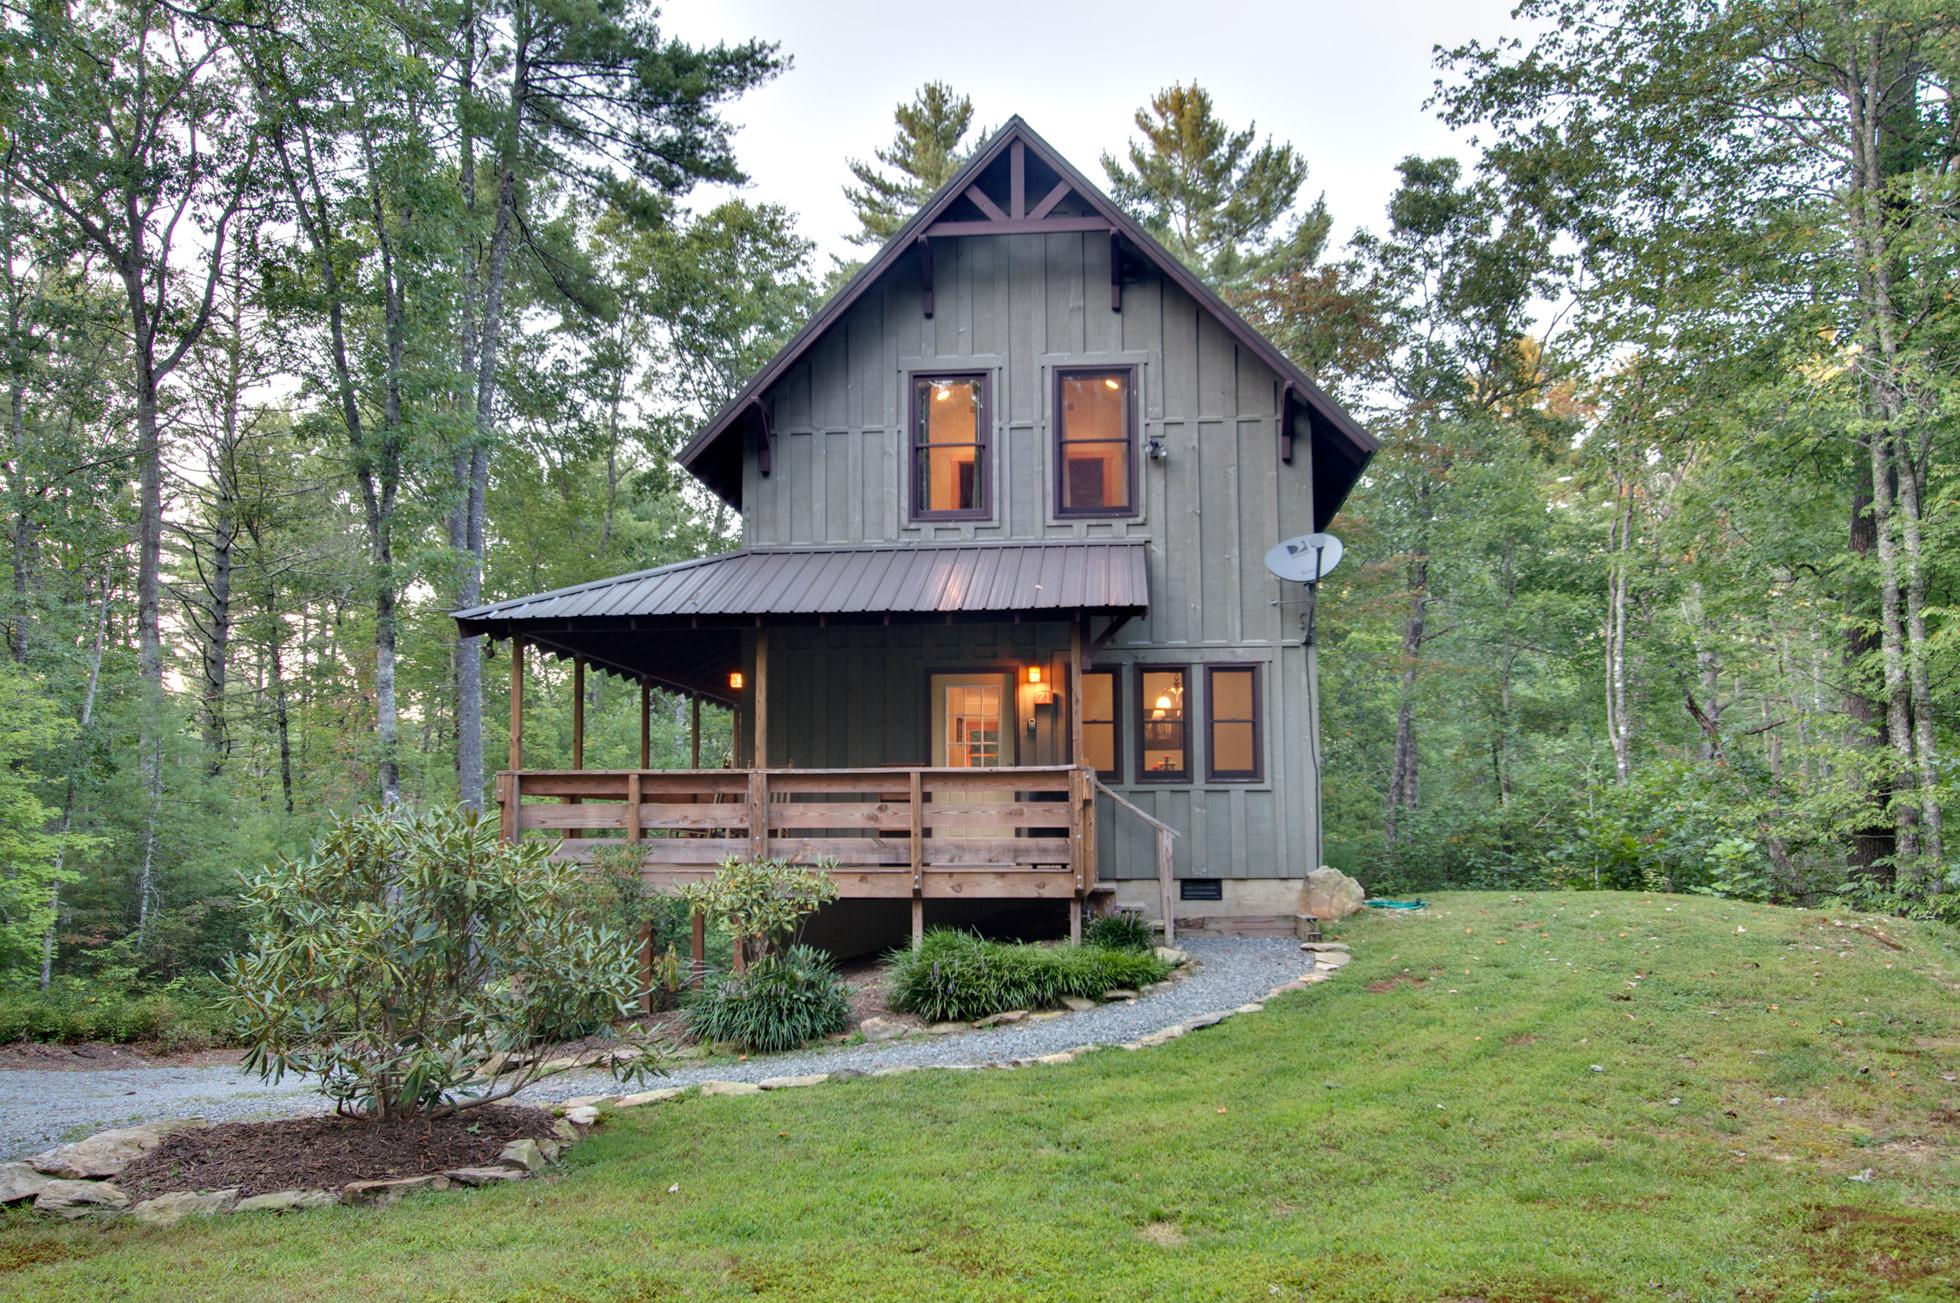 nashville latest in paw blog getaway friendly nc img retreat topics cabins dog brevard woods